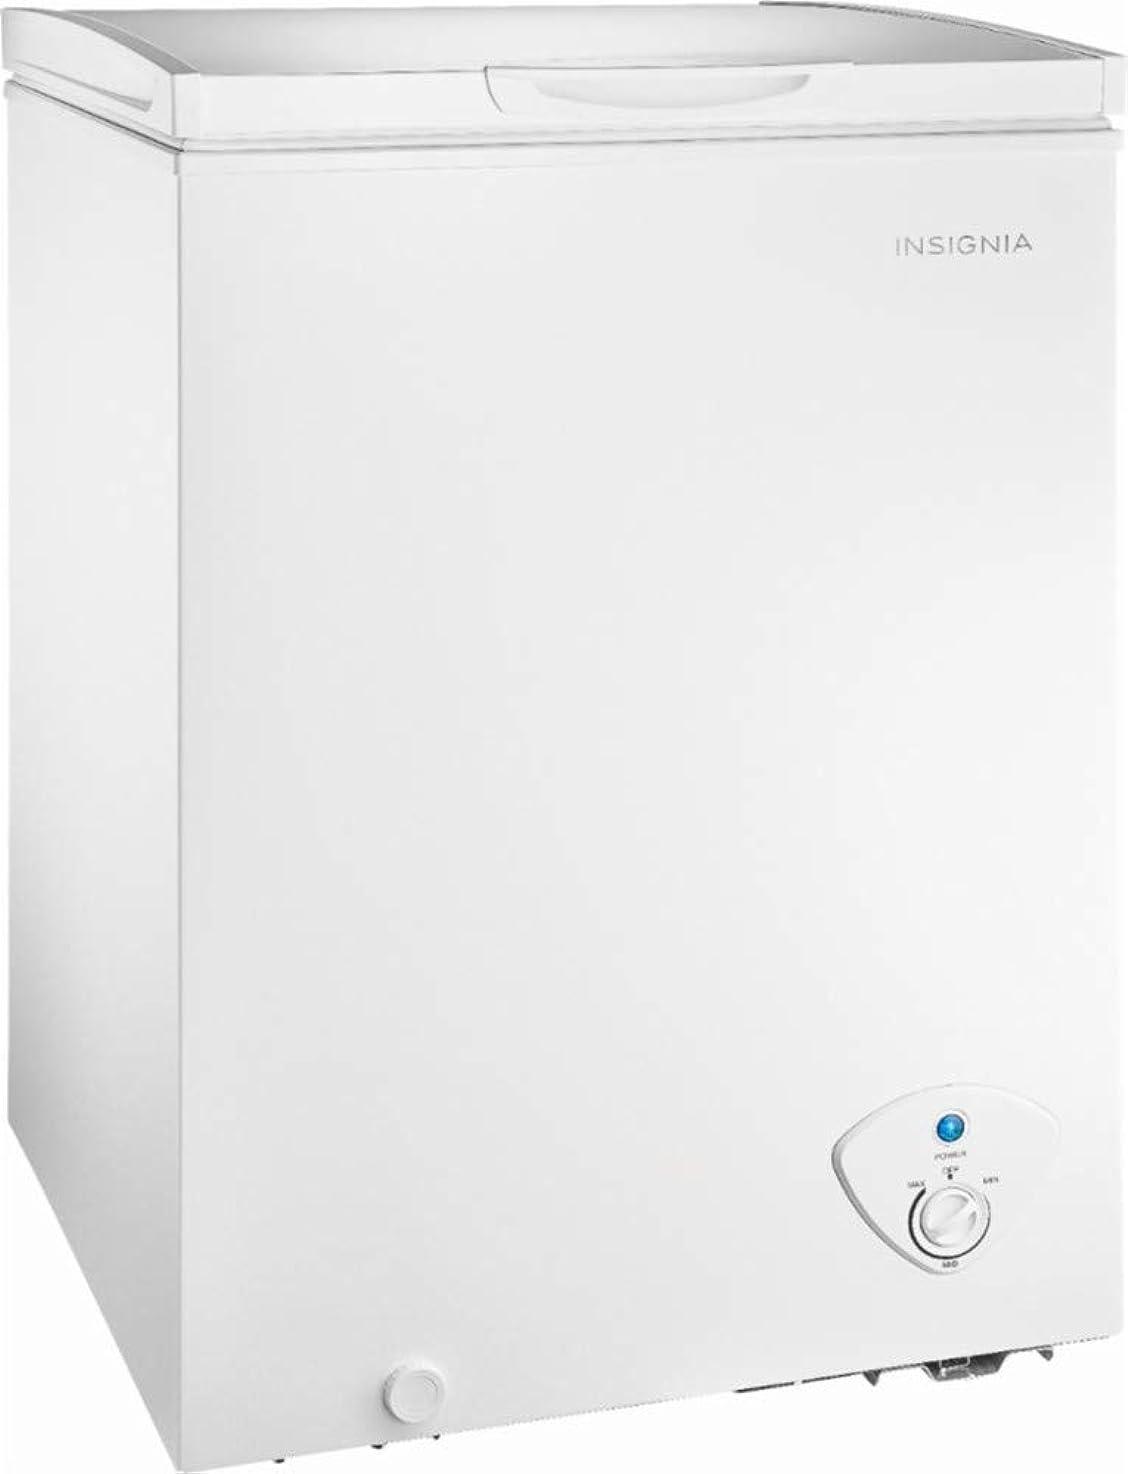 Insignia 3.5 Cu. Ft. Chest Freezer rpydumrkbndfg0